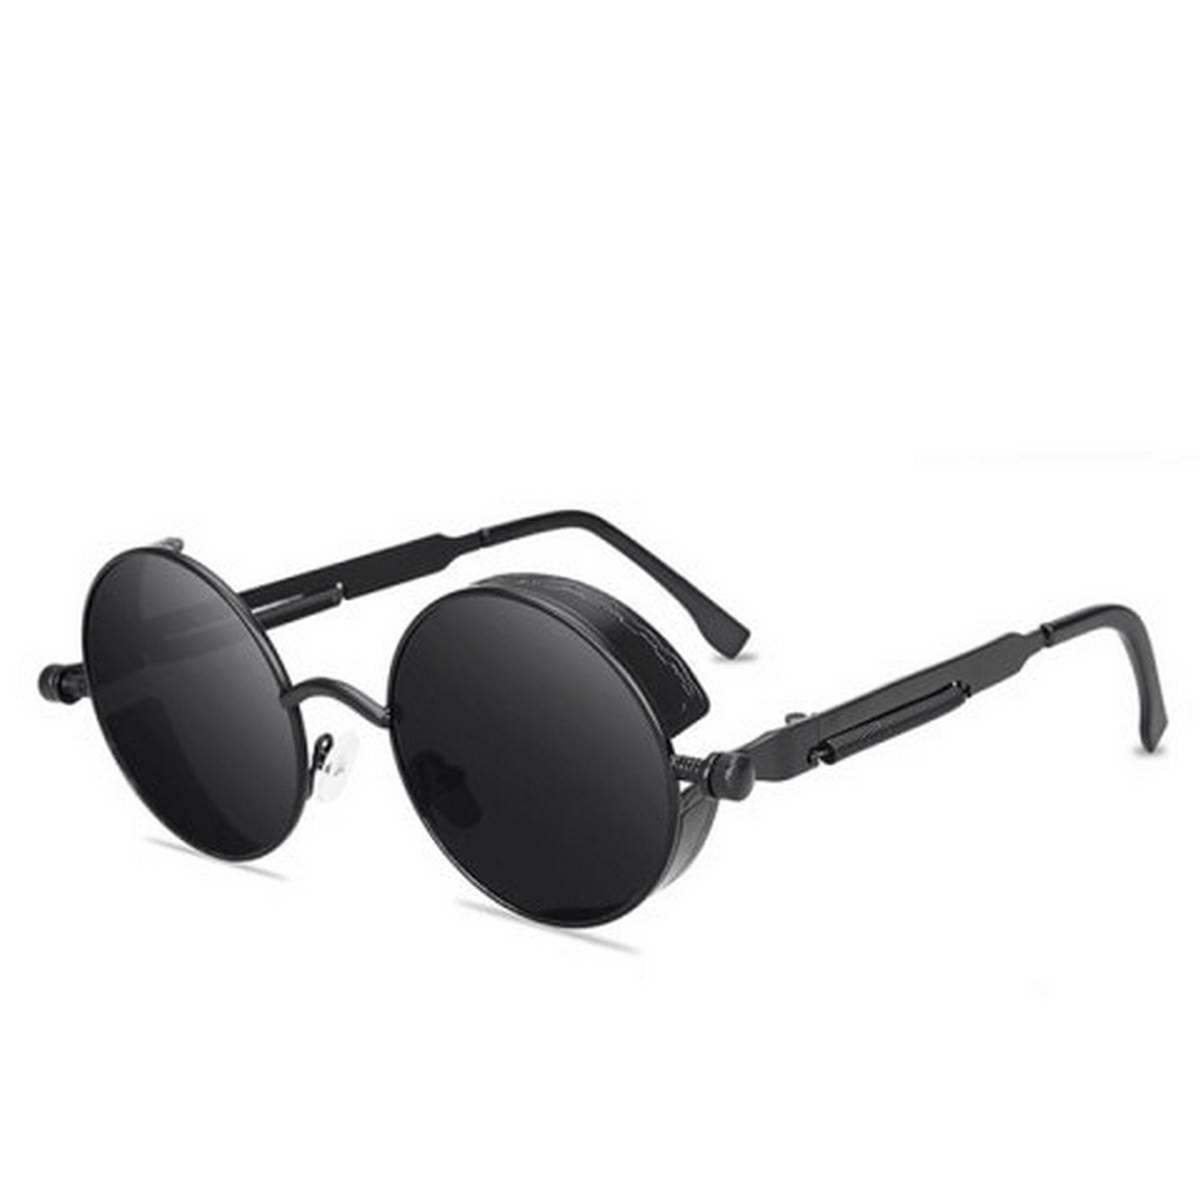 Sunglasses Polarized Lens Vintage Eyewear Accessories Sun Glasses plastic For Men ,